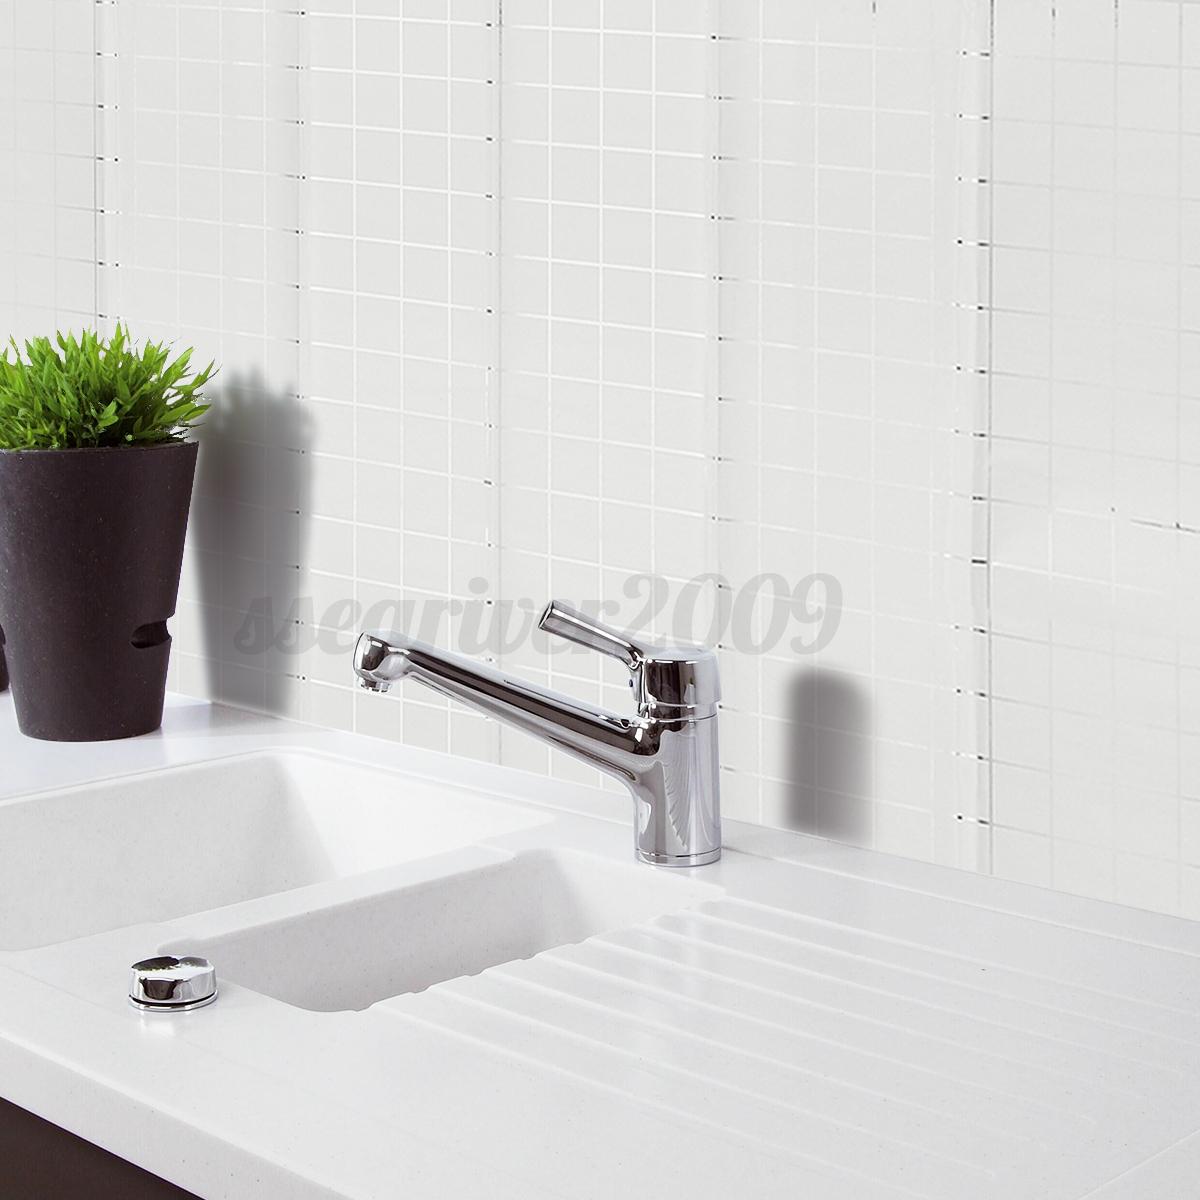 Selfadhesive 3d Mosaic Wall Paper Sticker Tile Floor